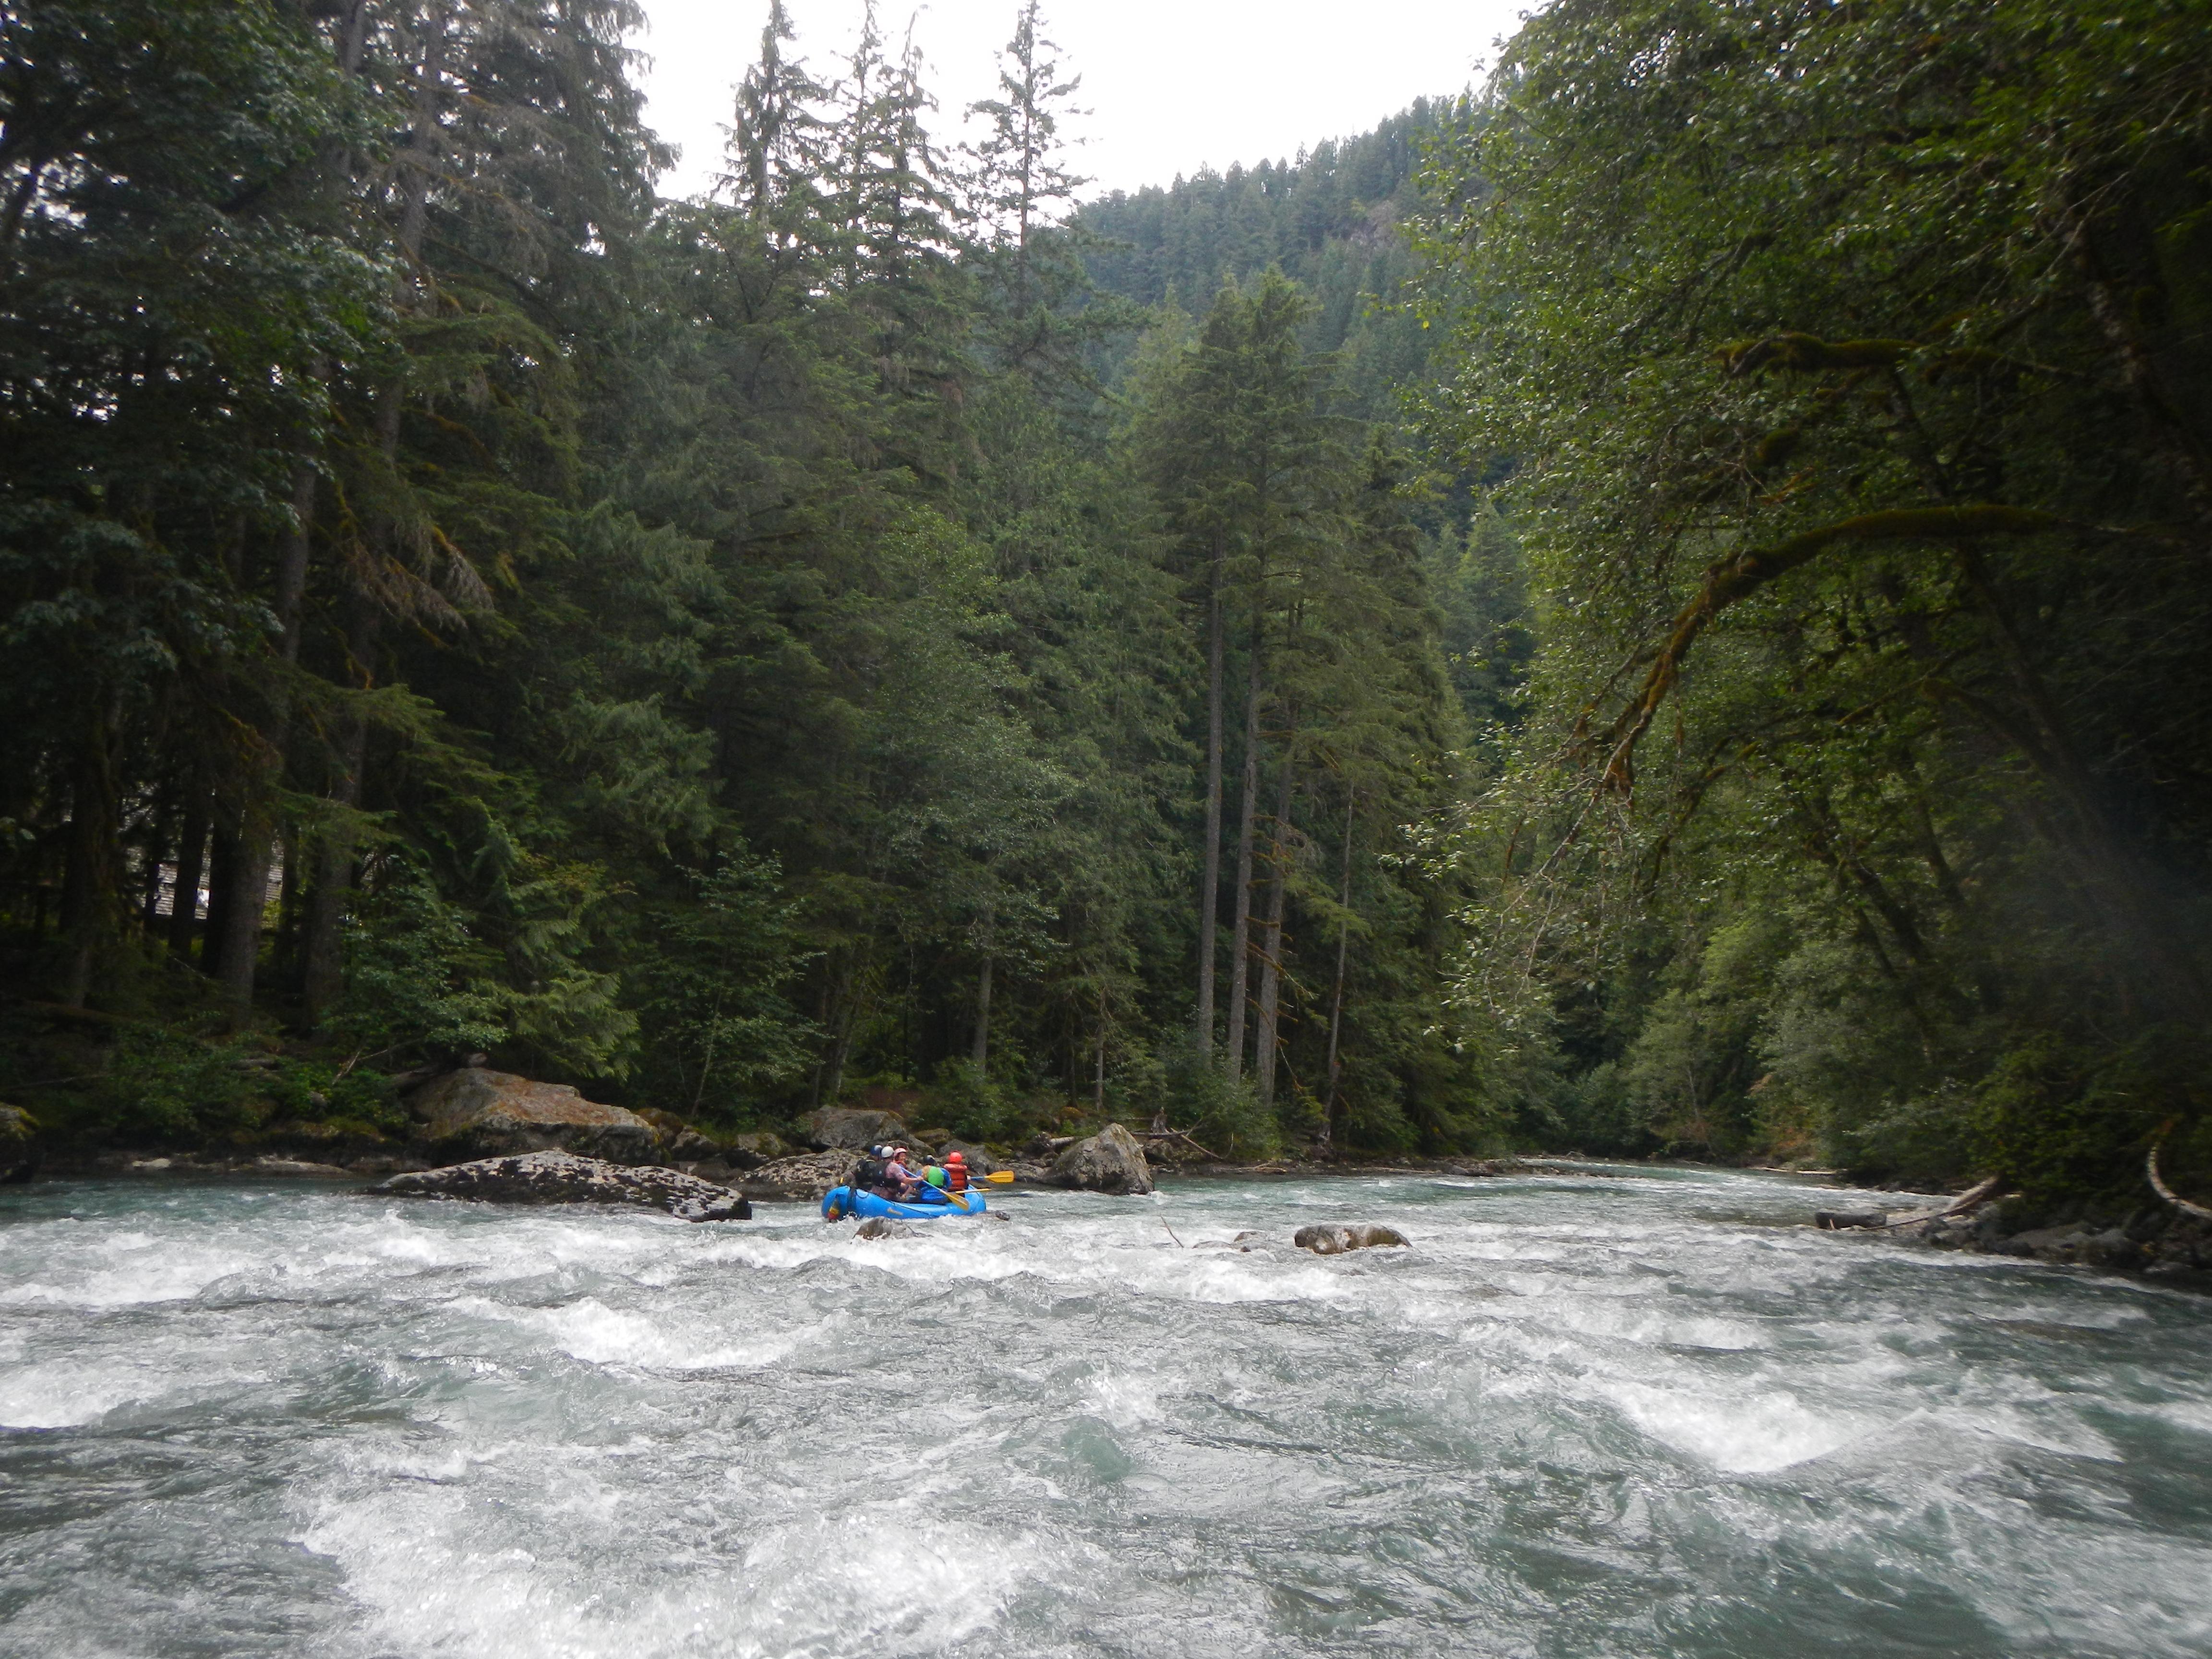 Drawn scenic river Tours On Congresswoman & 2016